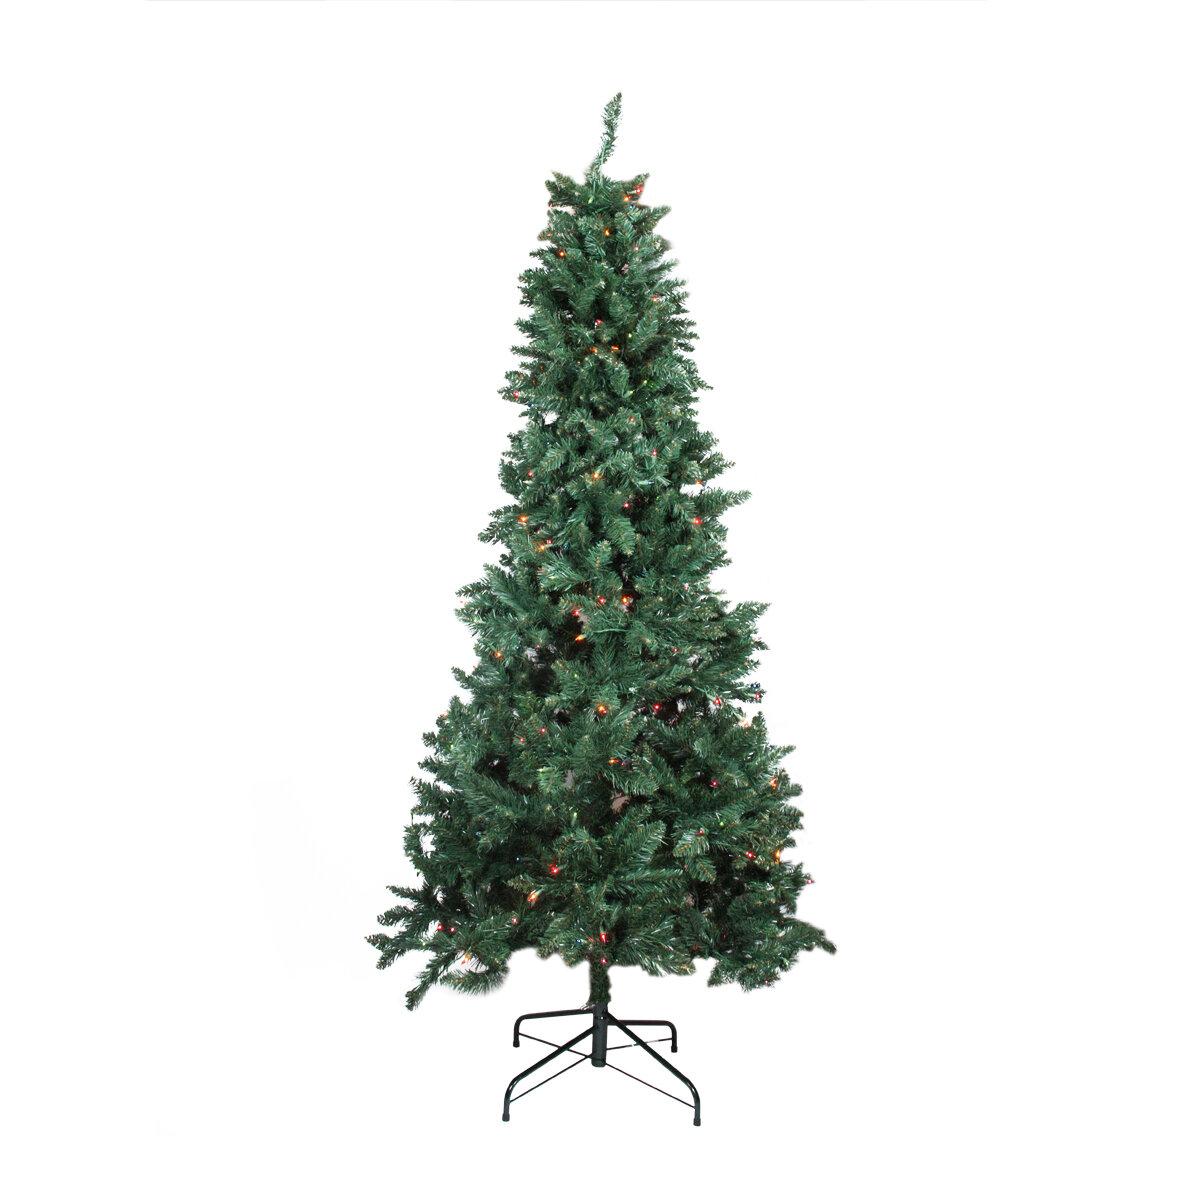 Northlight 7.5\' Slim Pine Artificial Christmas Tree with Multi-Color ...